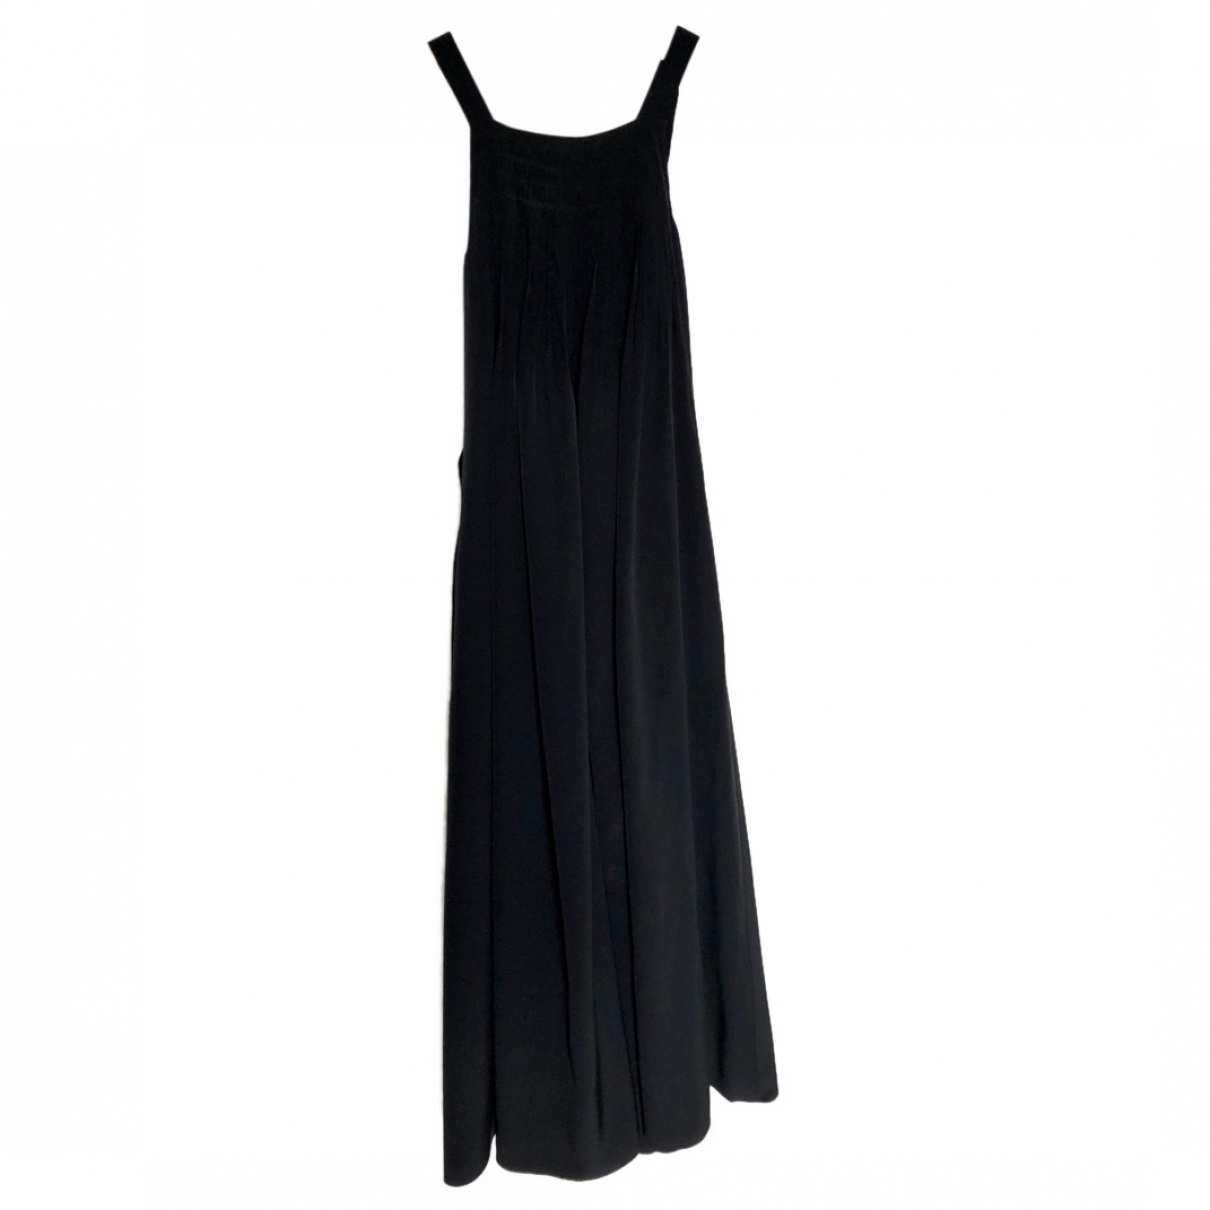 Tibi \N Kleid in  Schwarz Seide